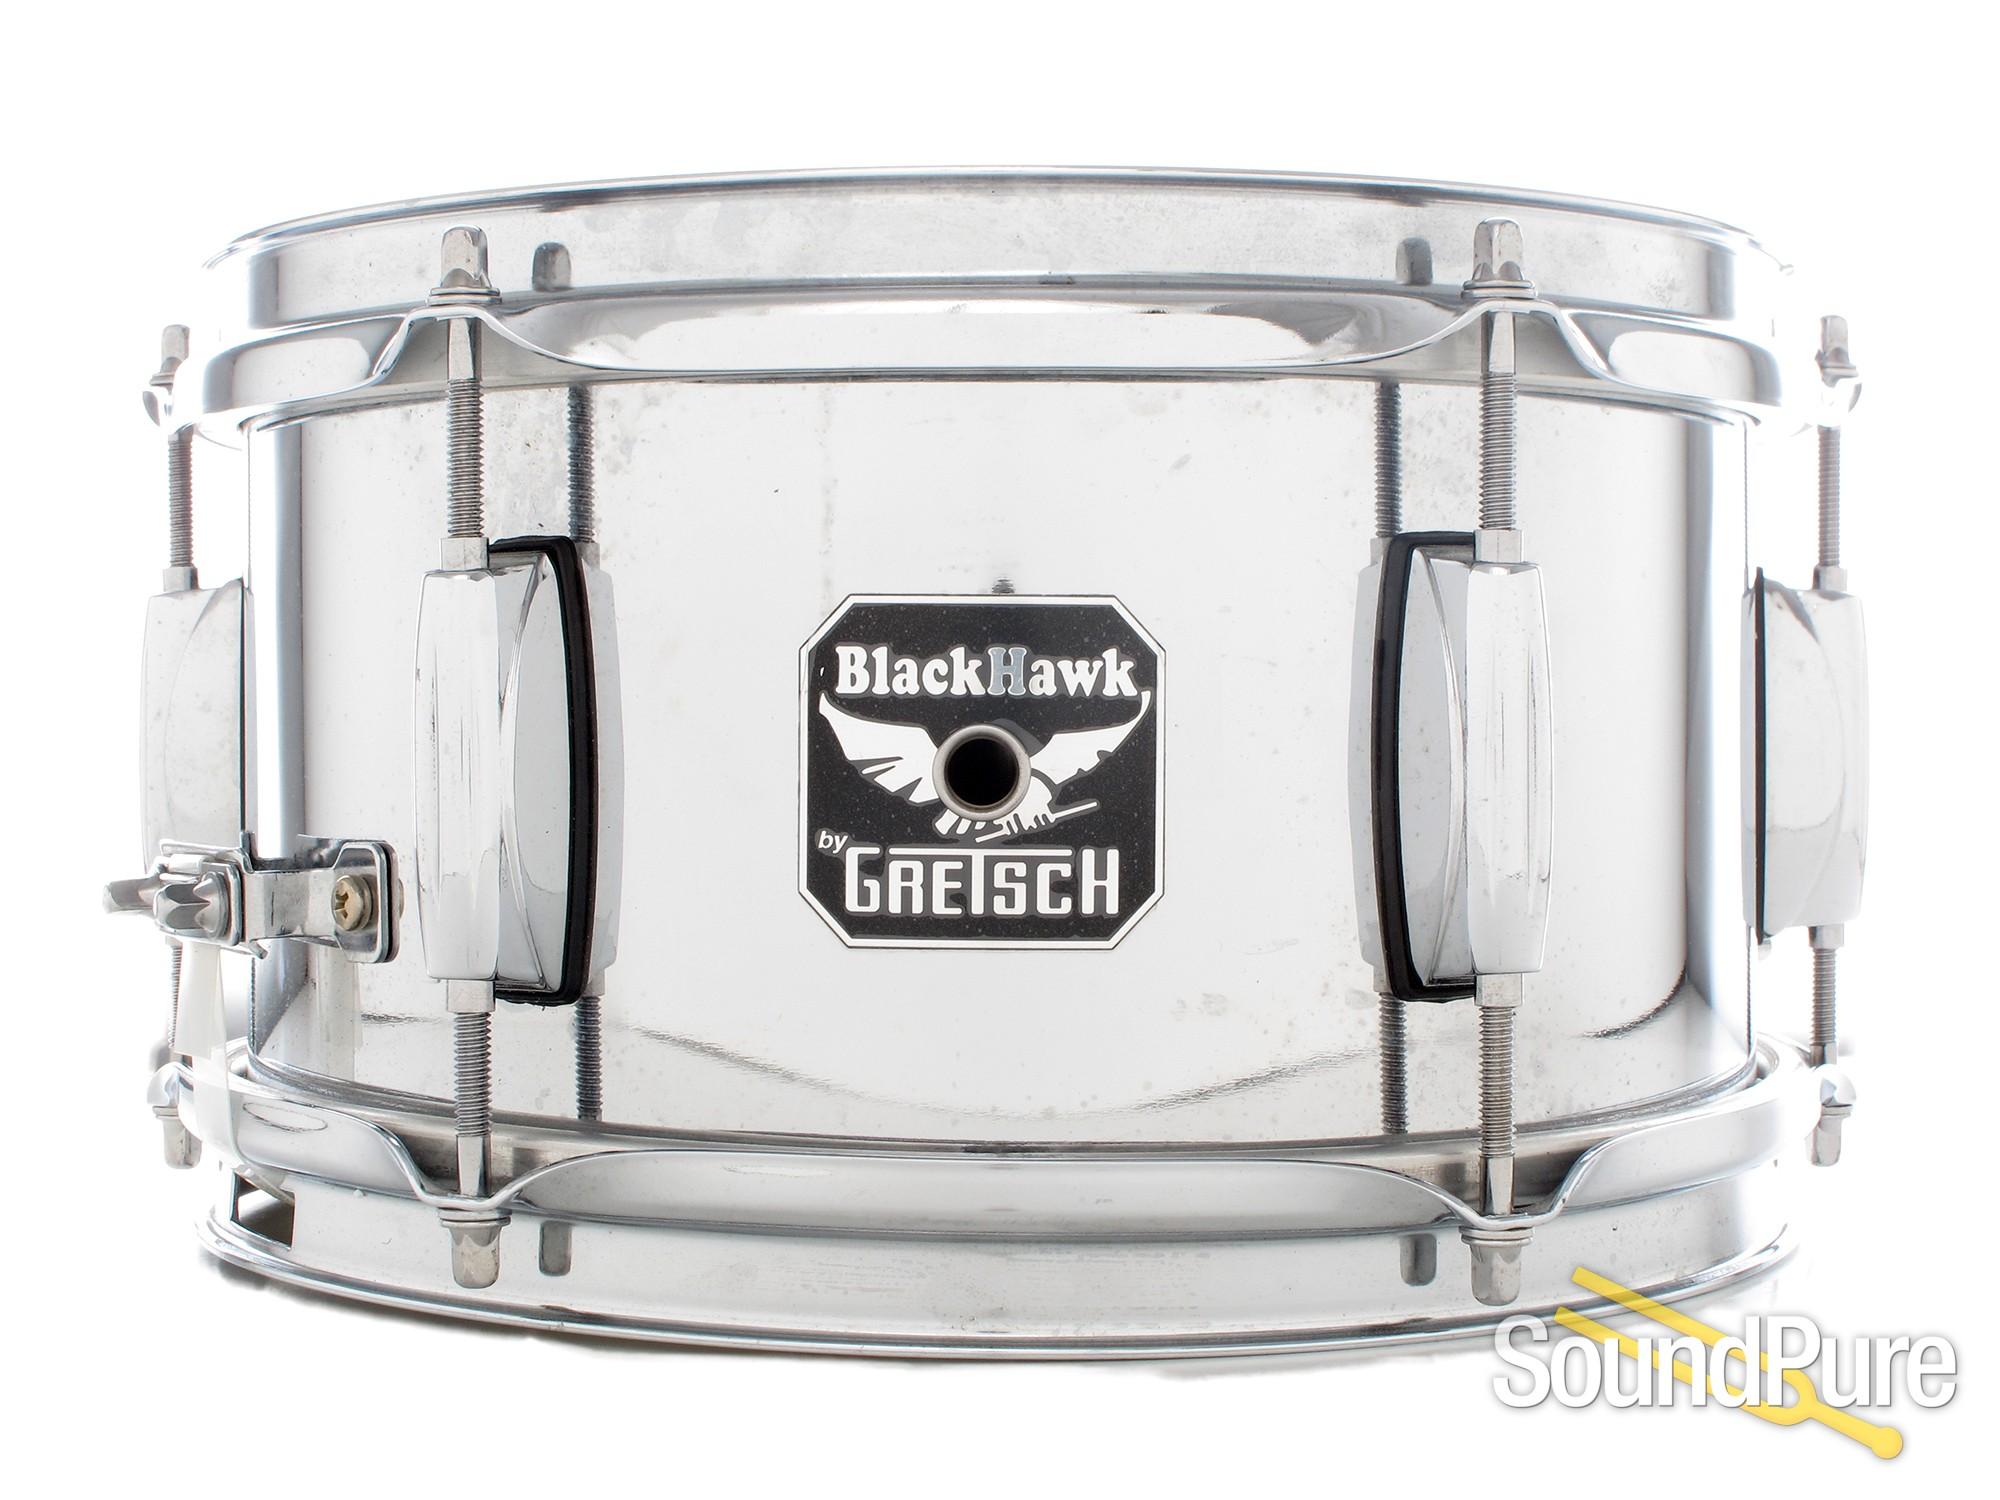 Gretsch 6x10 Blackhawk Steel Snare Drum | Soundpure.com